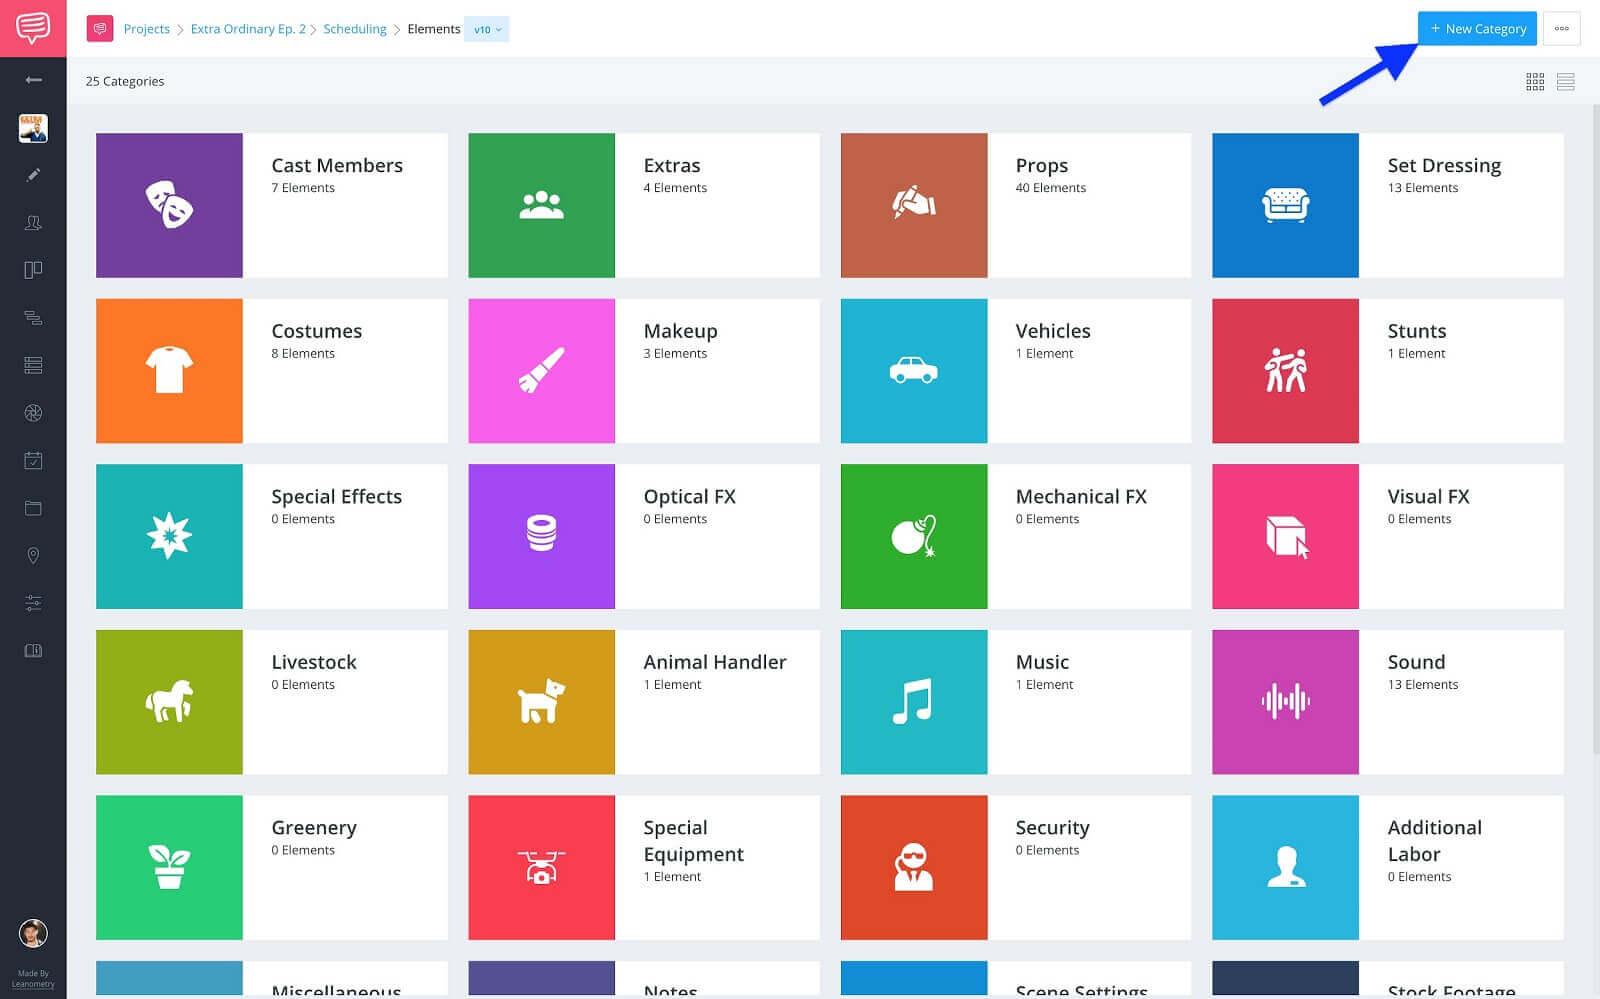 Breakdown Element Categories - Click +New Element